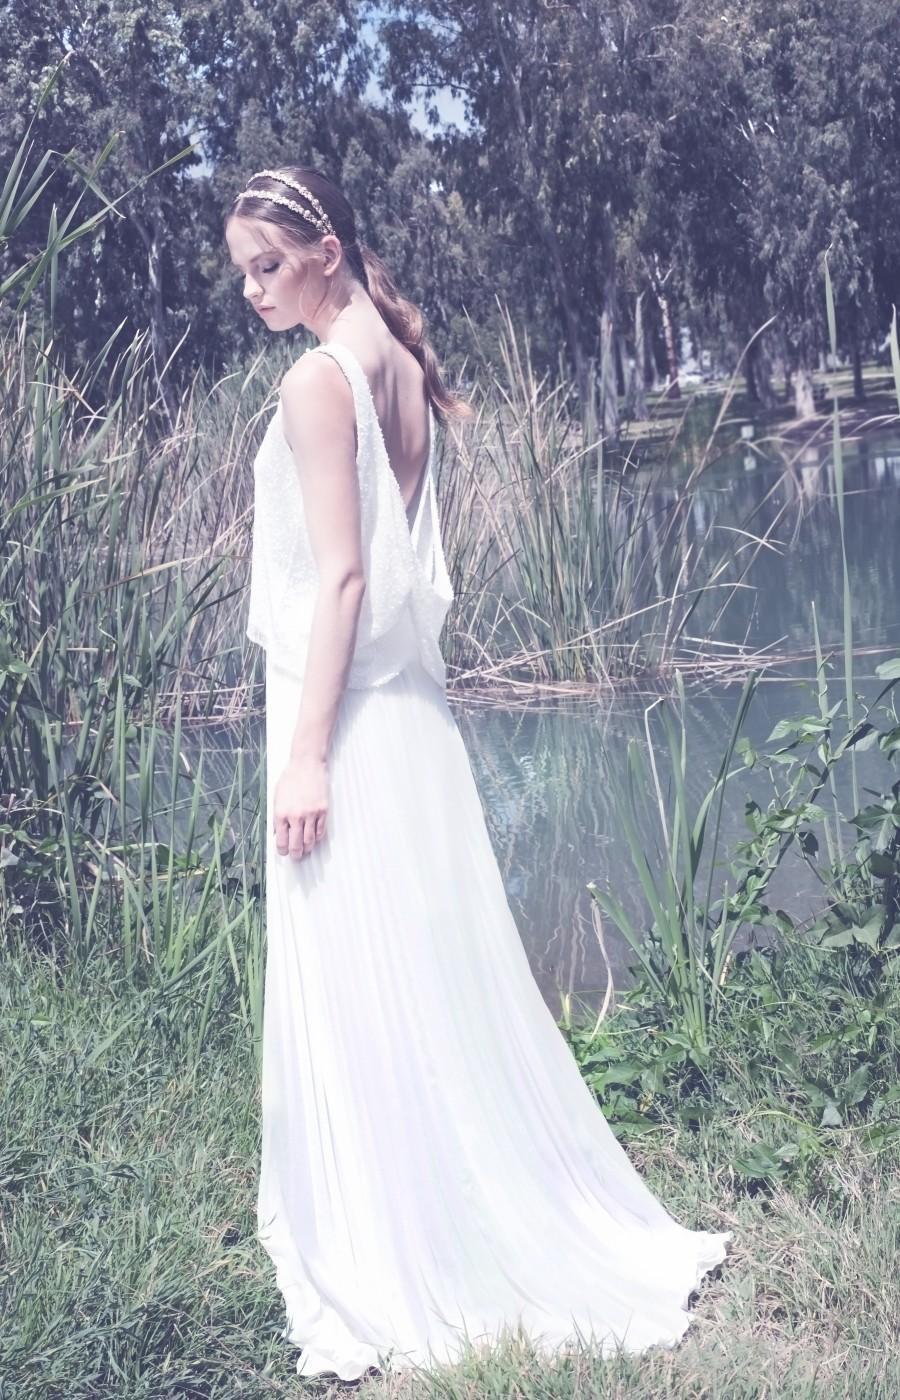 زفاف - Marina Valery wedding collection Fairy Tale